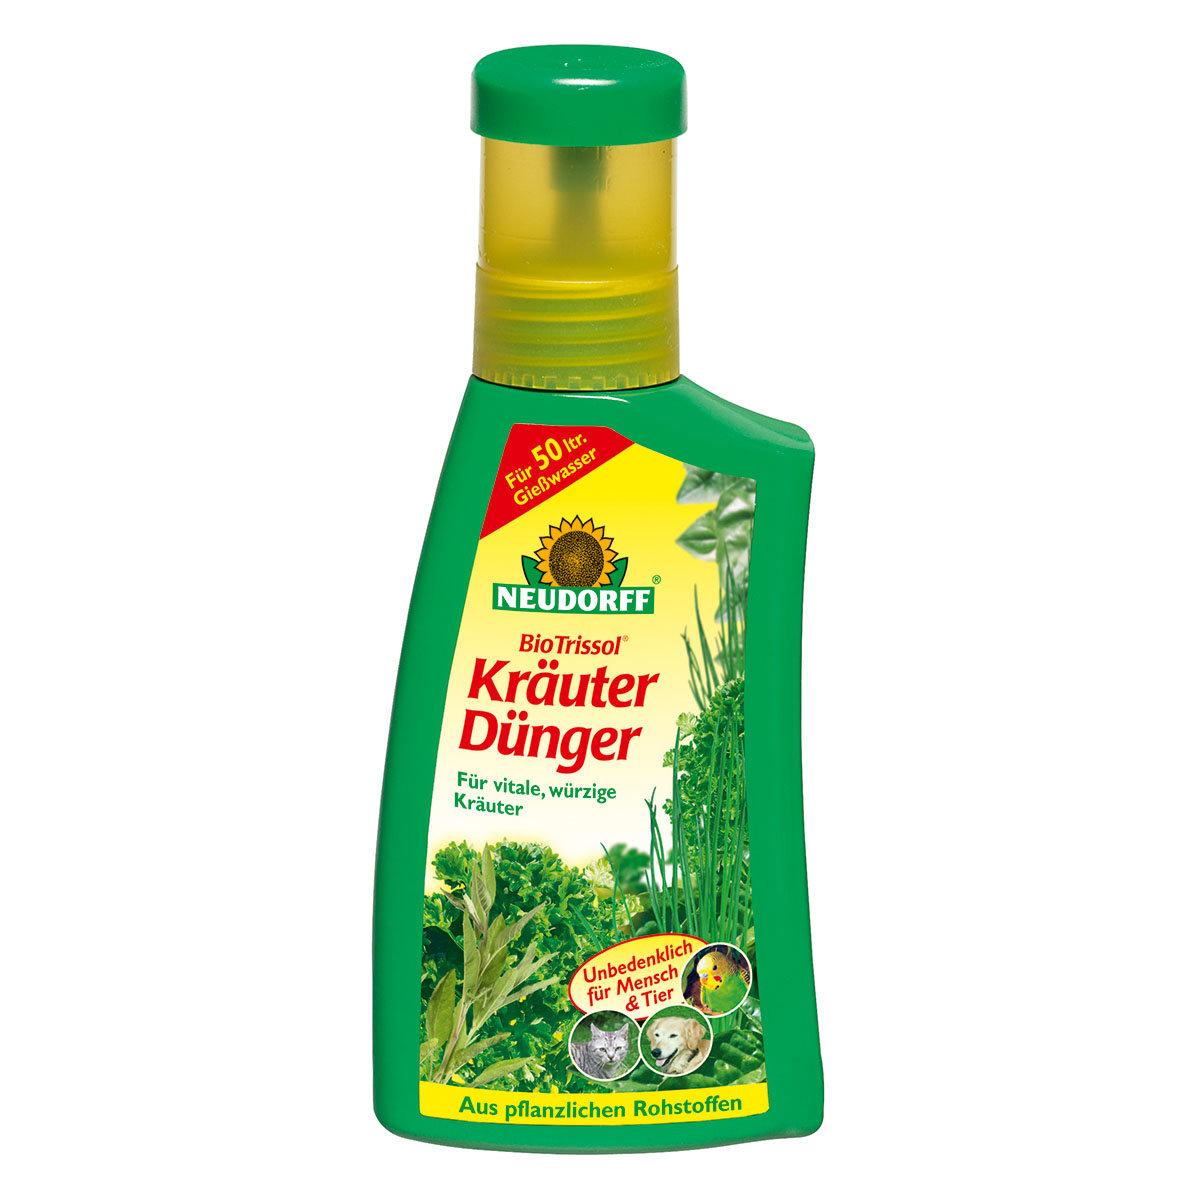 Neudorff® BioTrissol® KräuterDünger, 250 ml